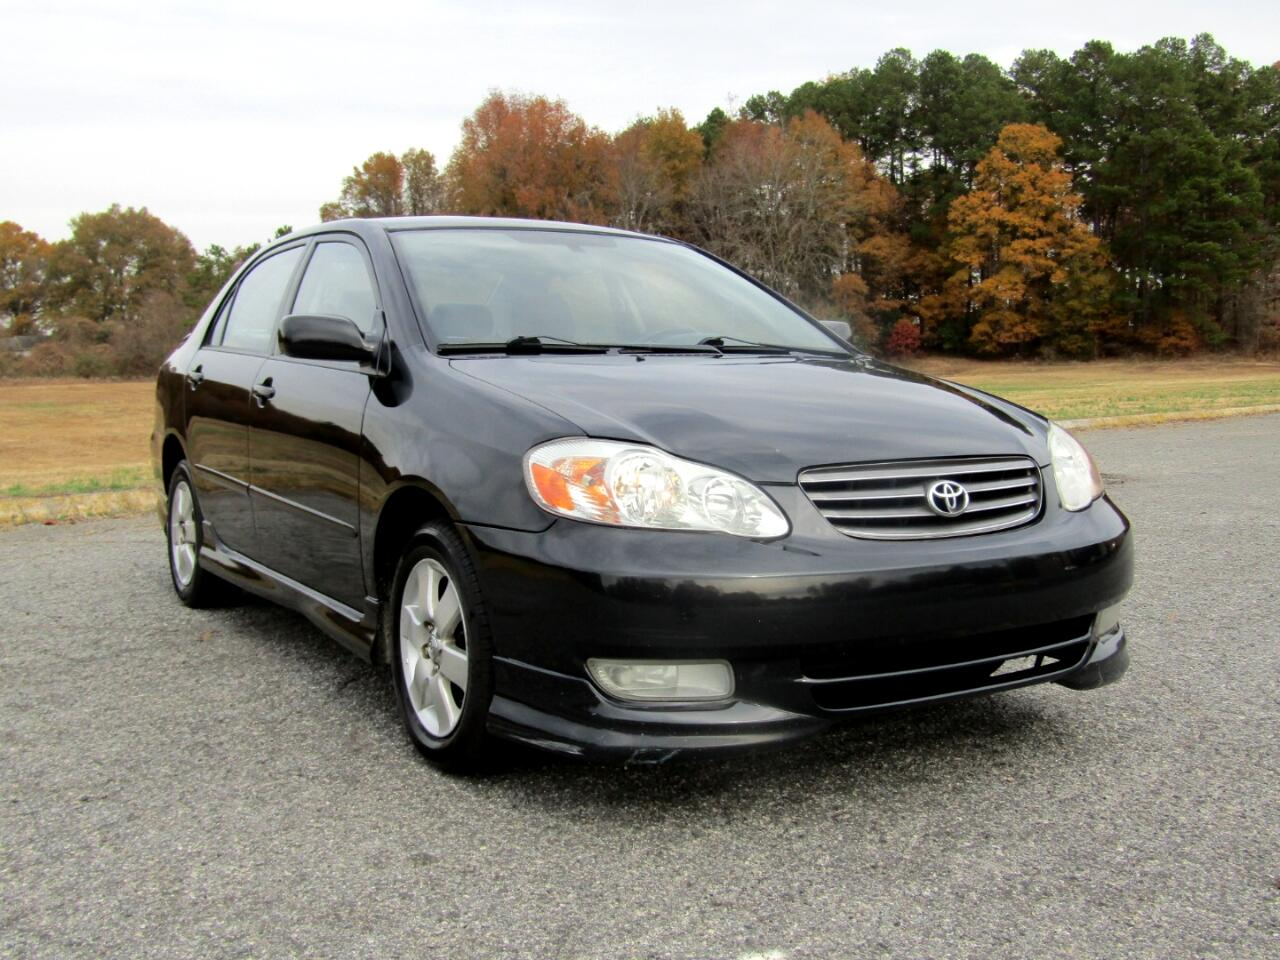 2003 Toyota Corolla CE